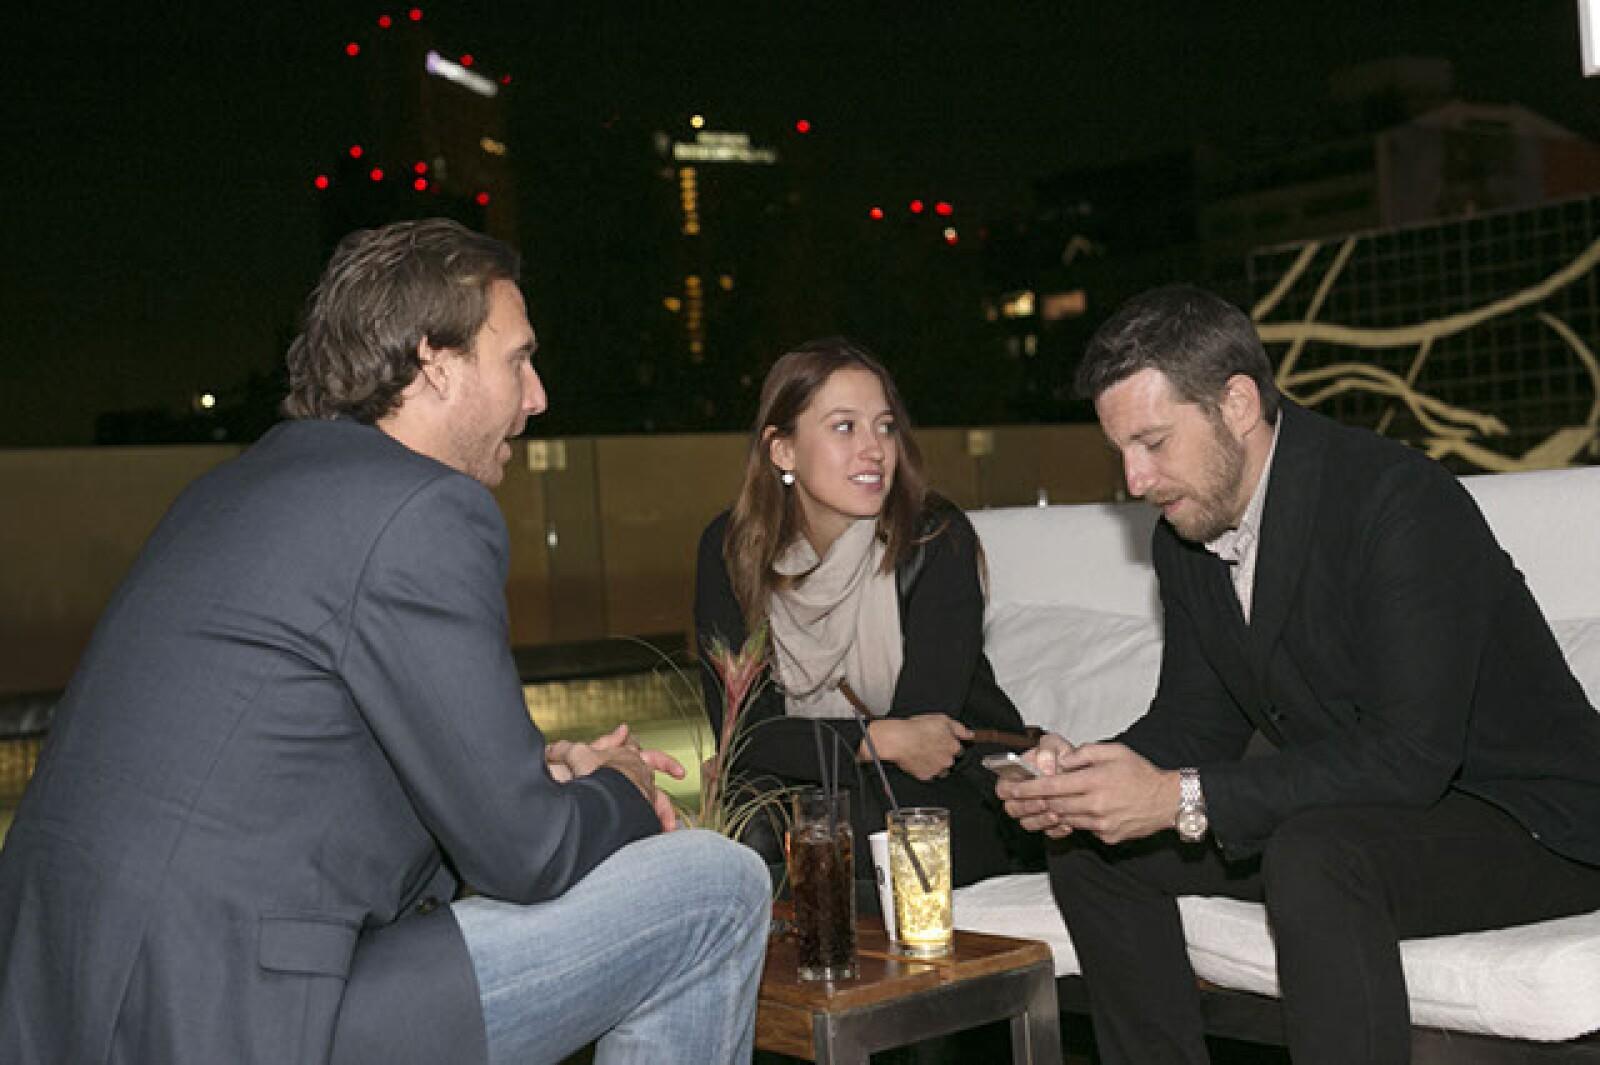 Justin Petsche,Gabriela Barrera y Joseph Henrits